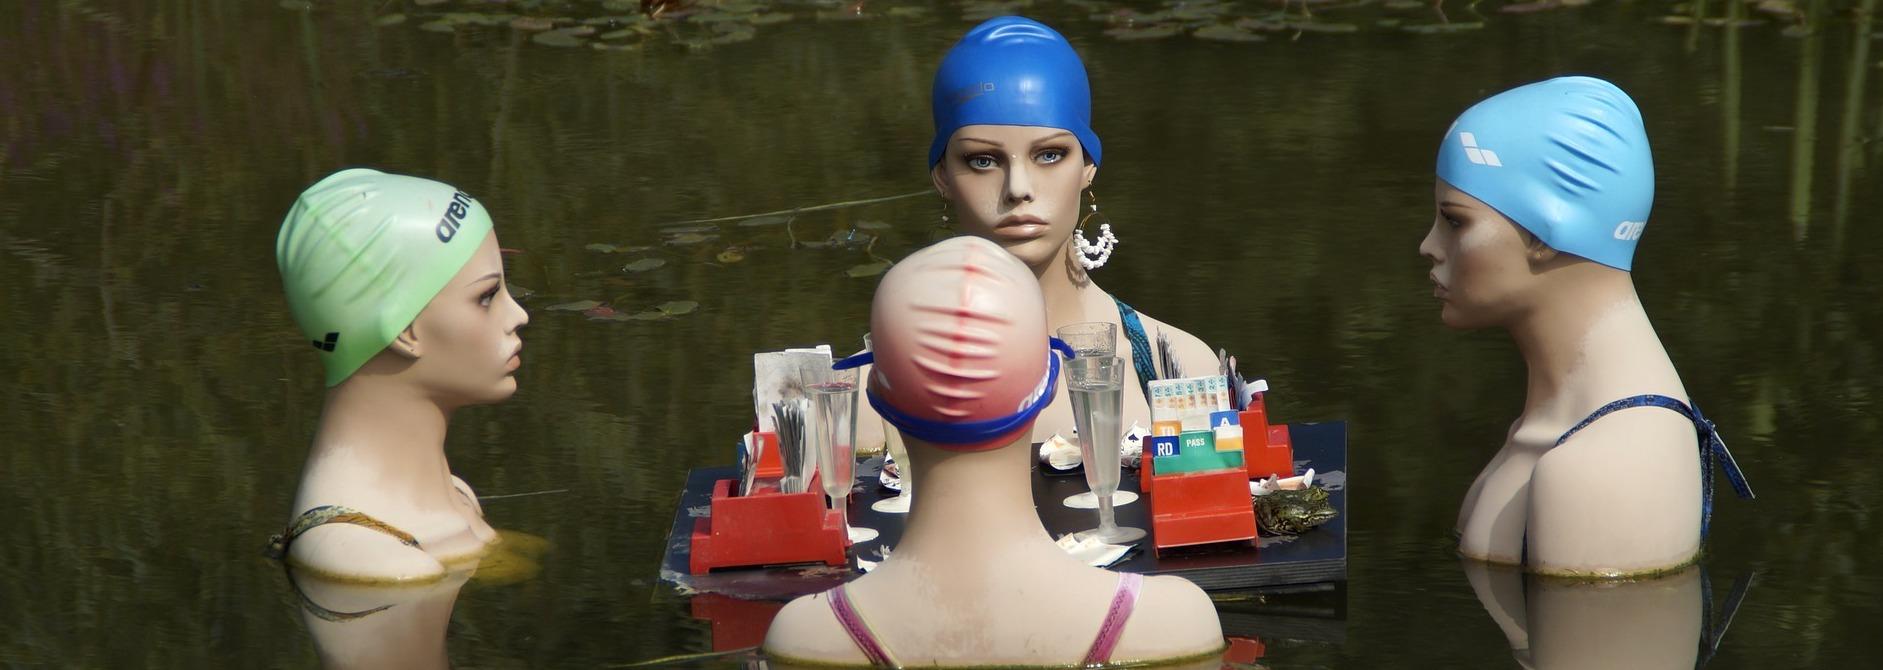 swim-cap-group.jpg